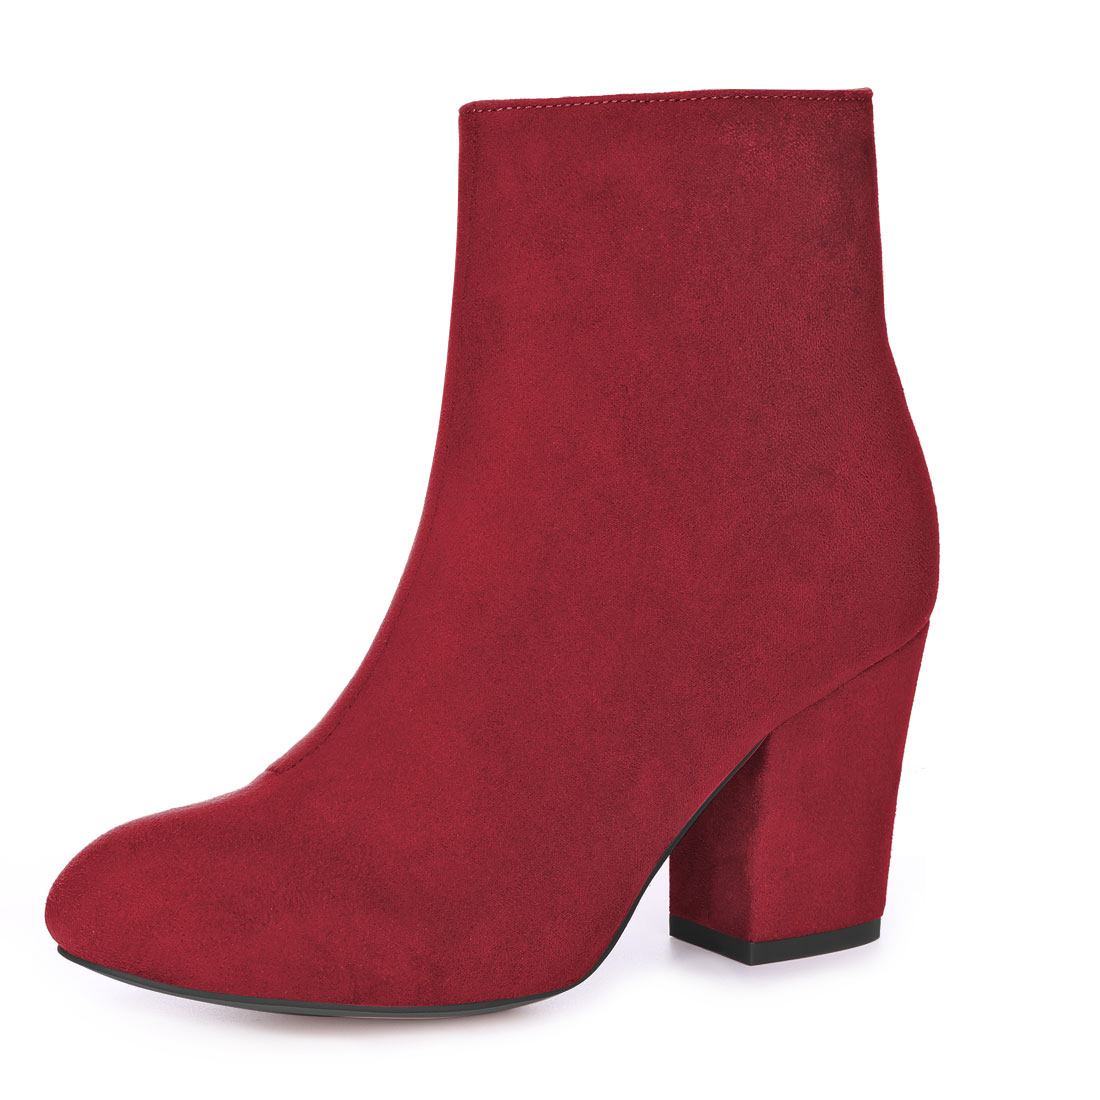 Allegra K Women Round Toe Side Zipper Block Heel Ankle Boots Red US 9